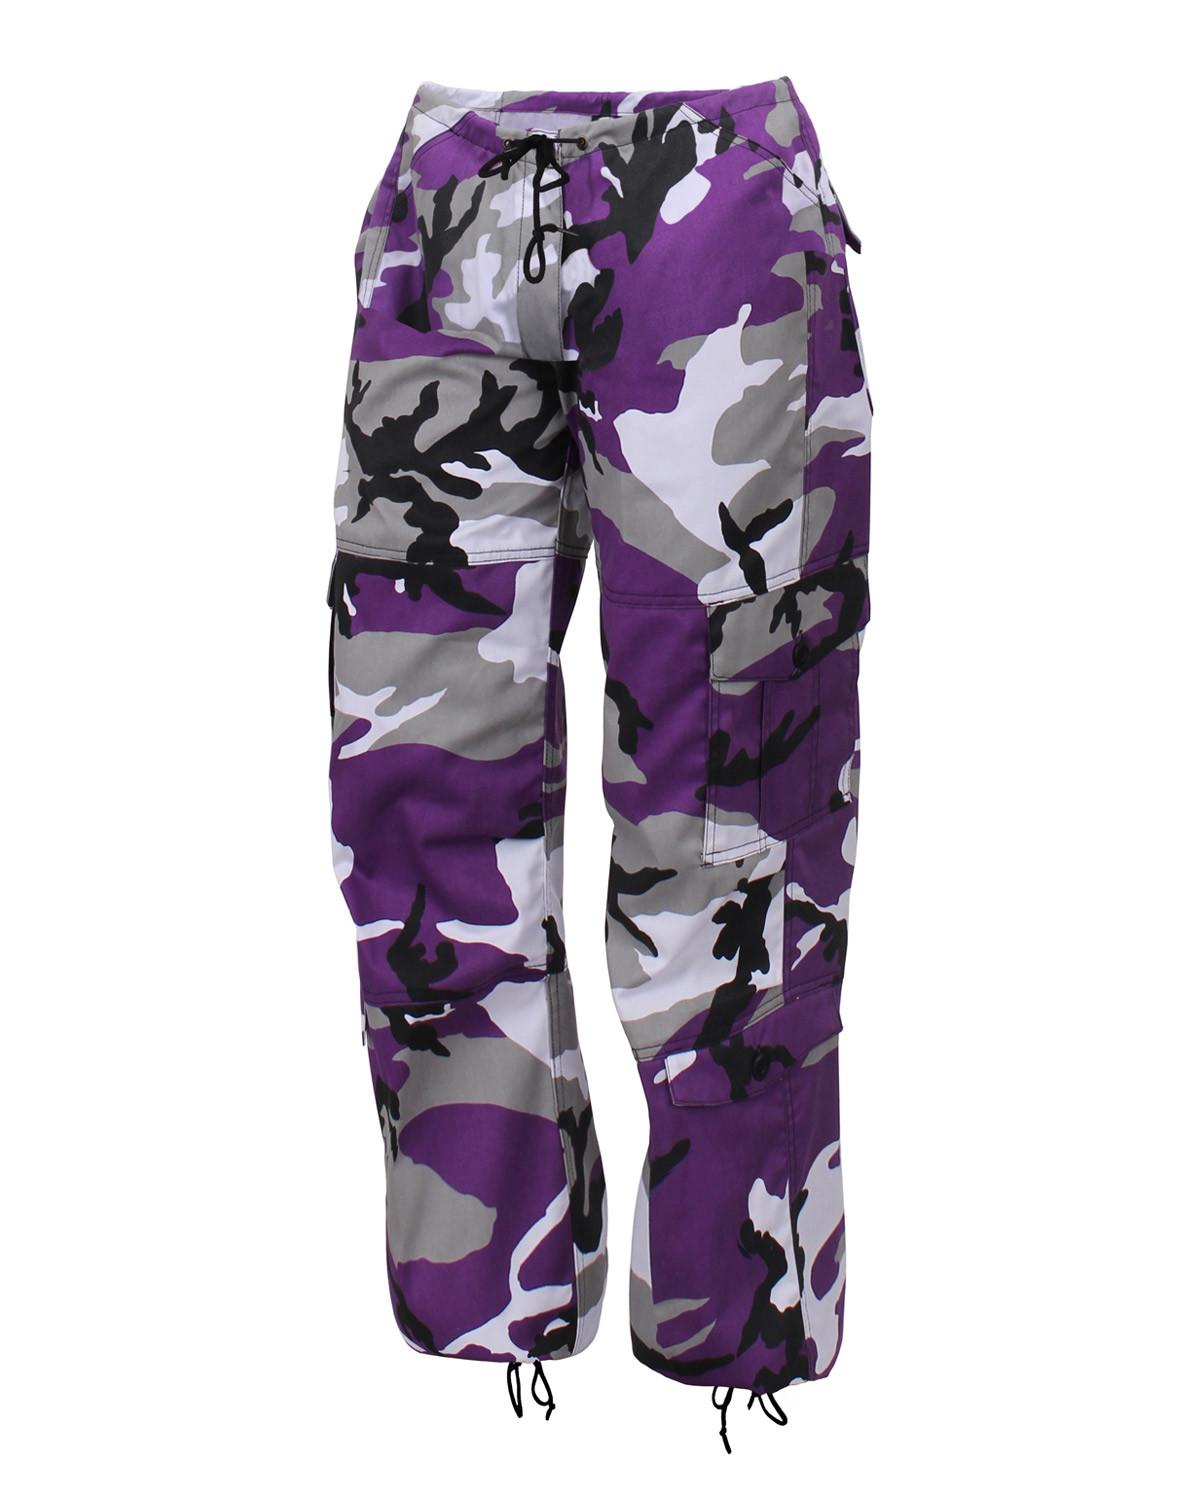 Rothco Kamouflage Army Byxor (Lila Camo, XXS)